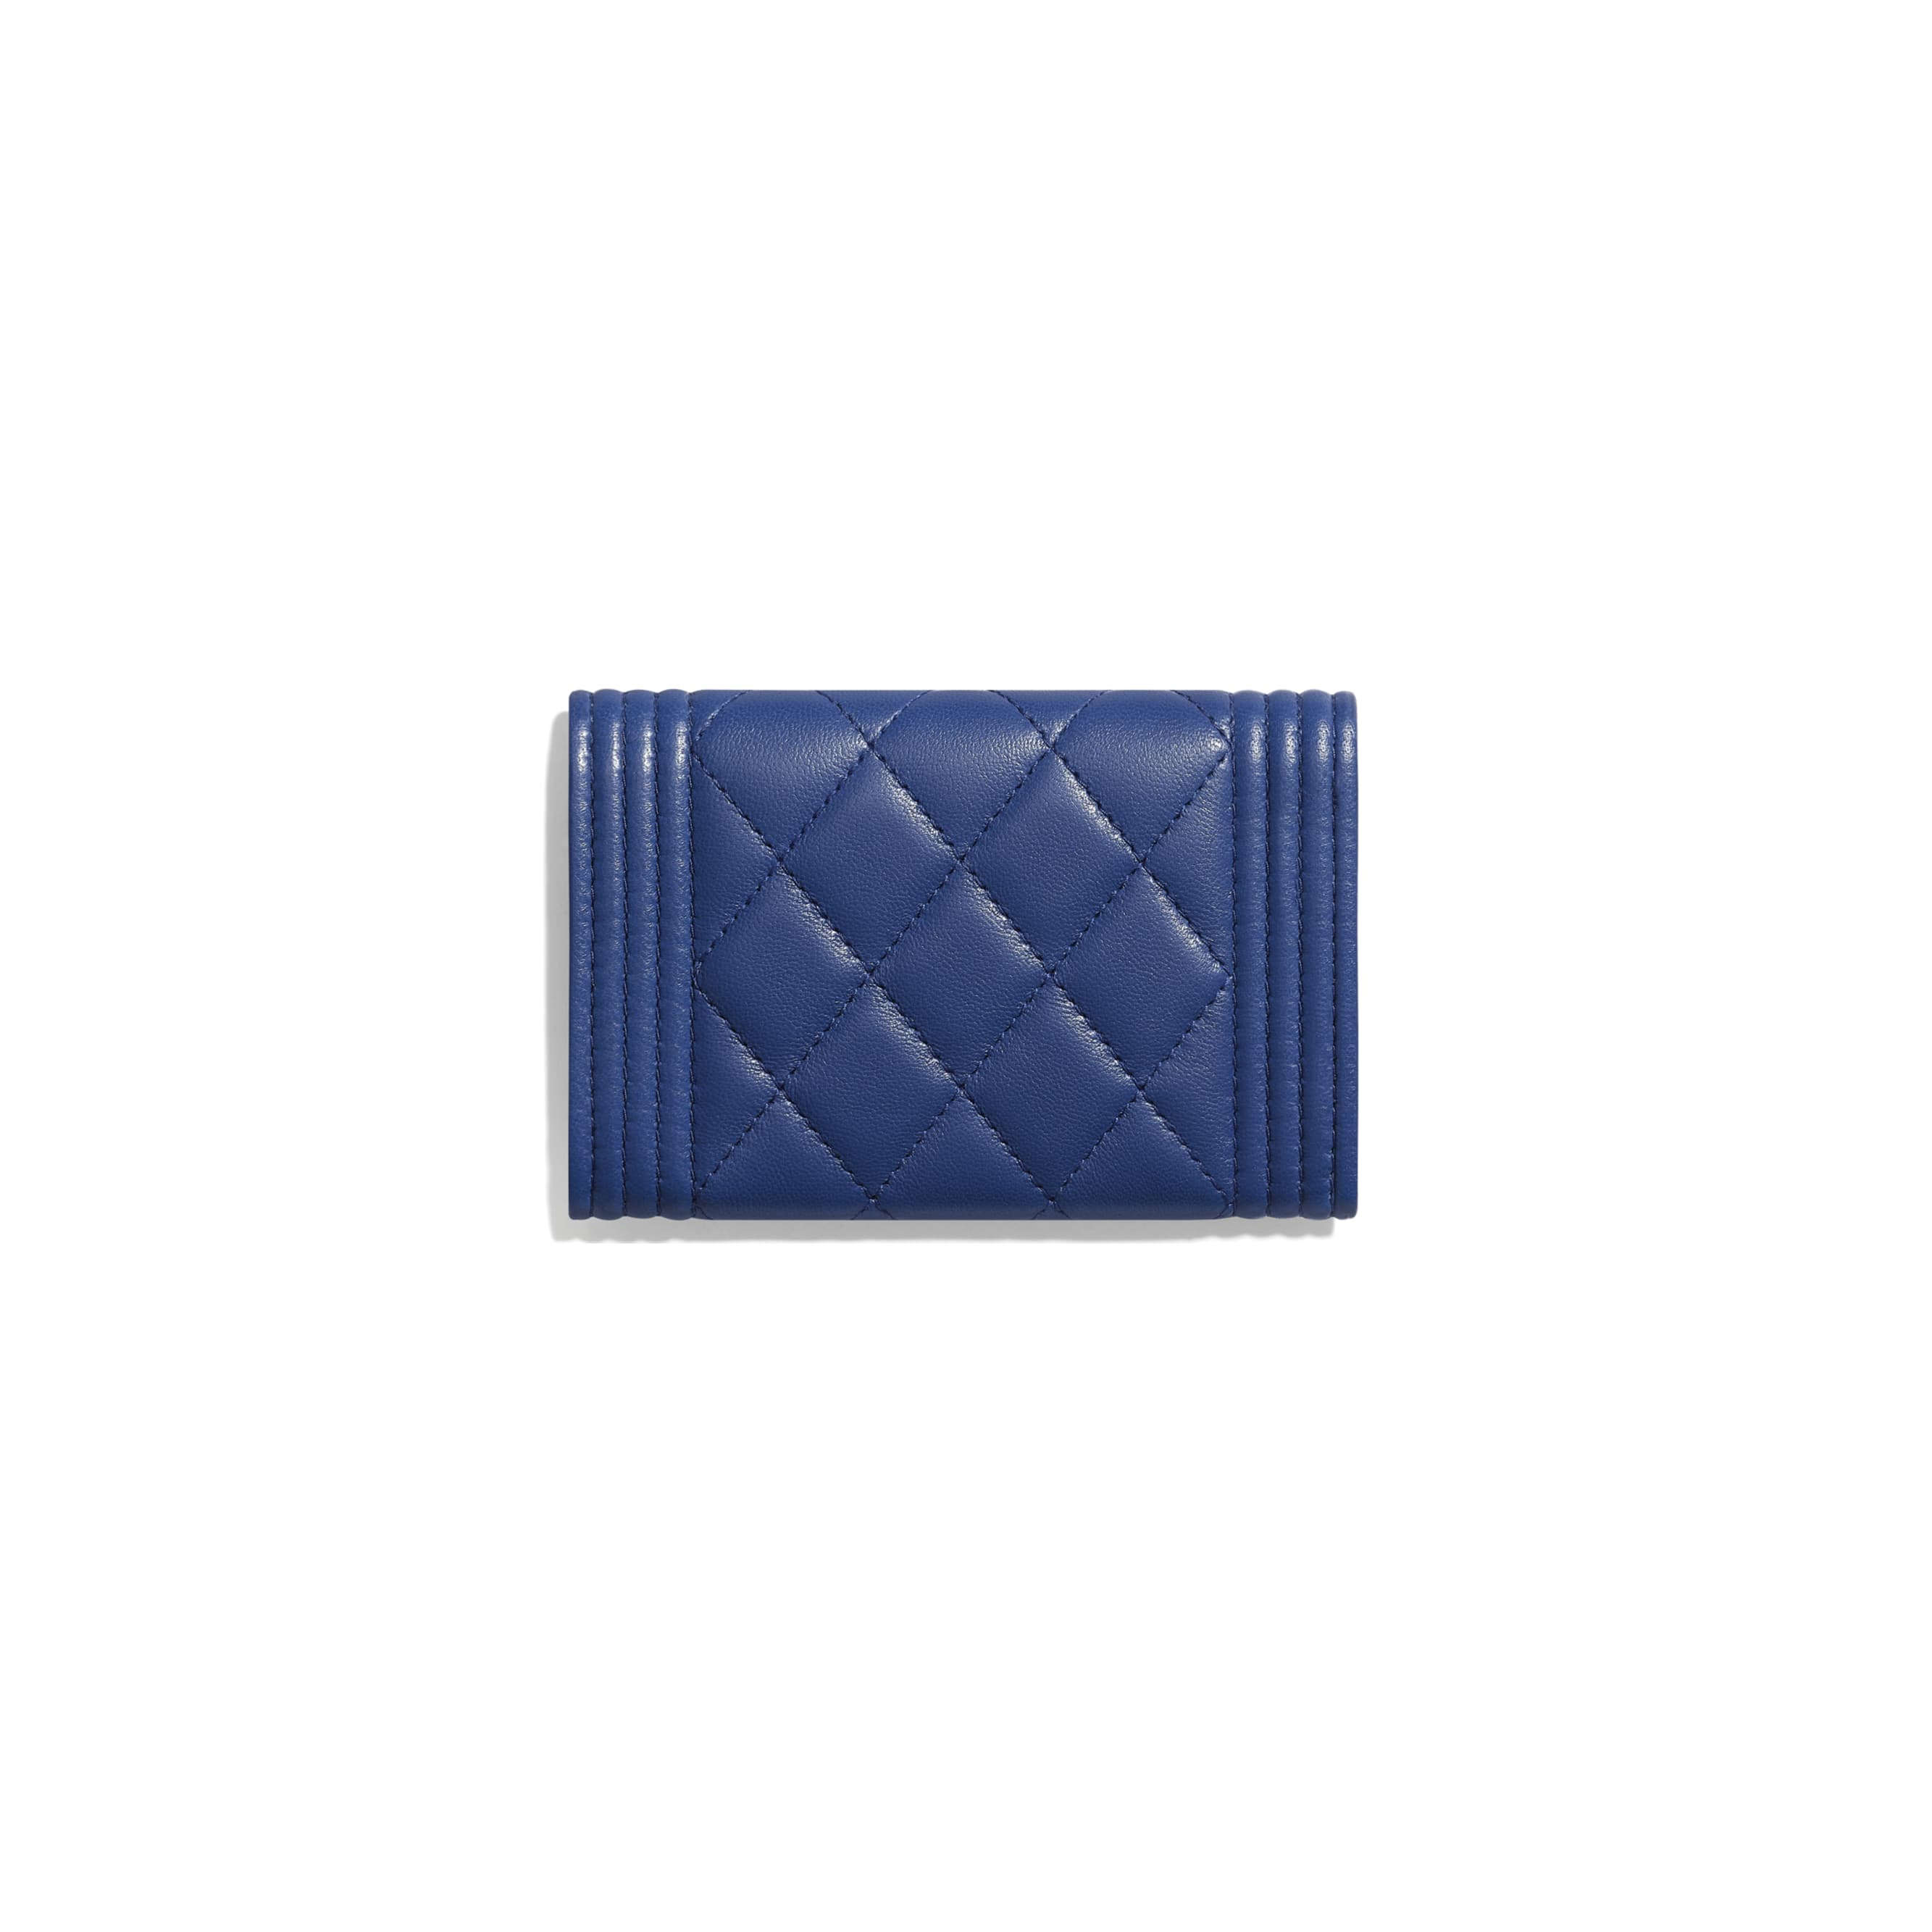 BOY CHANEL Flap Card Holder - Dark Blue - Lambskin & Gold-Tone Metal - CHANEL - Alternative view - see standard sized version